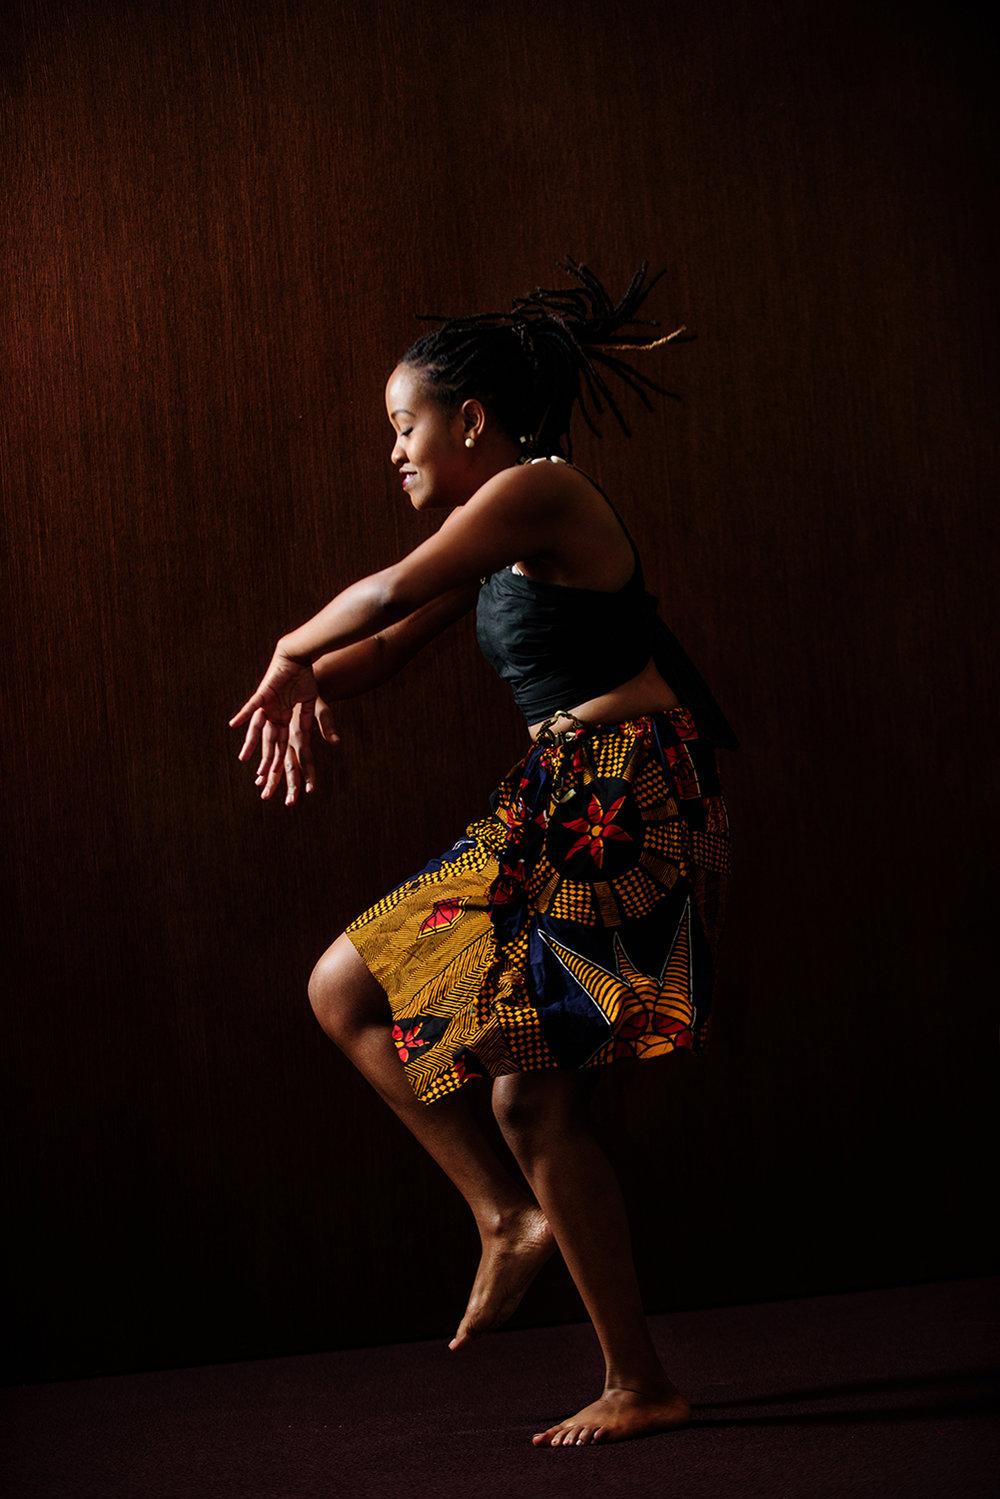 African Rhythms - at the Philadelphia Museum of Art...